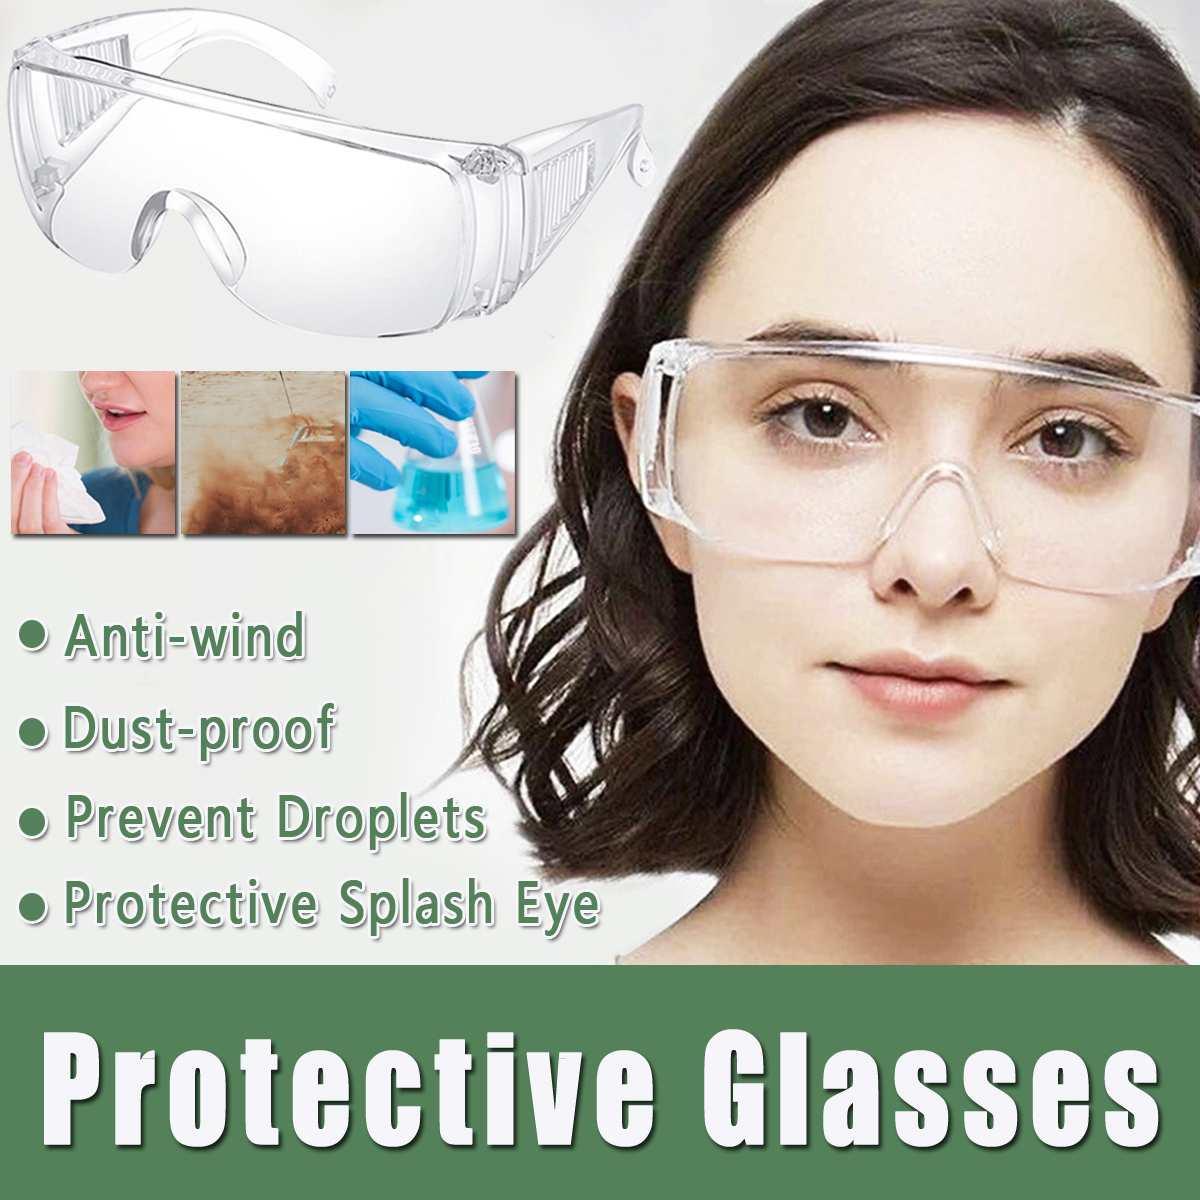 Safety Goggles Glasses Transparent Dust-Proof Glasses Working Glasses Lab Dental Eyewear Splash Eye Protective Anti-wind Glasses